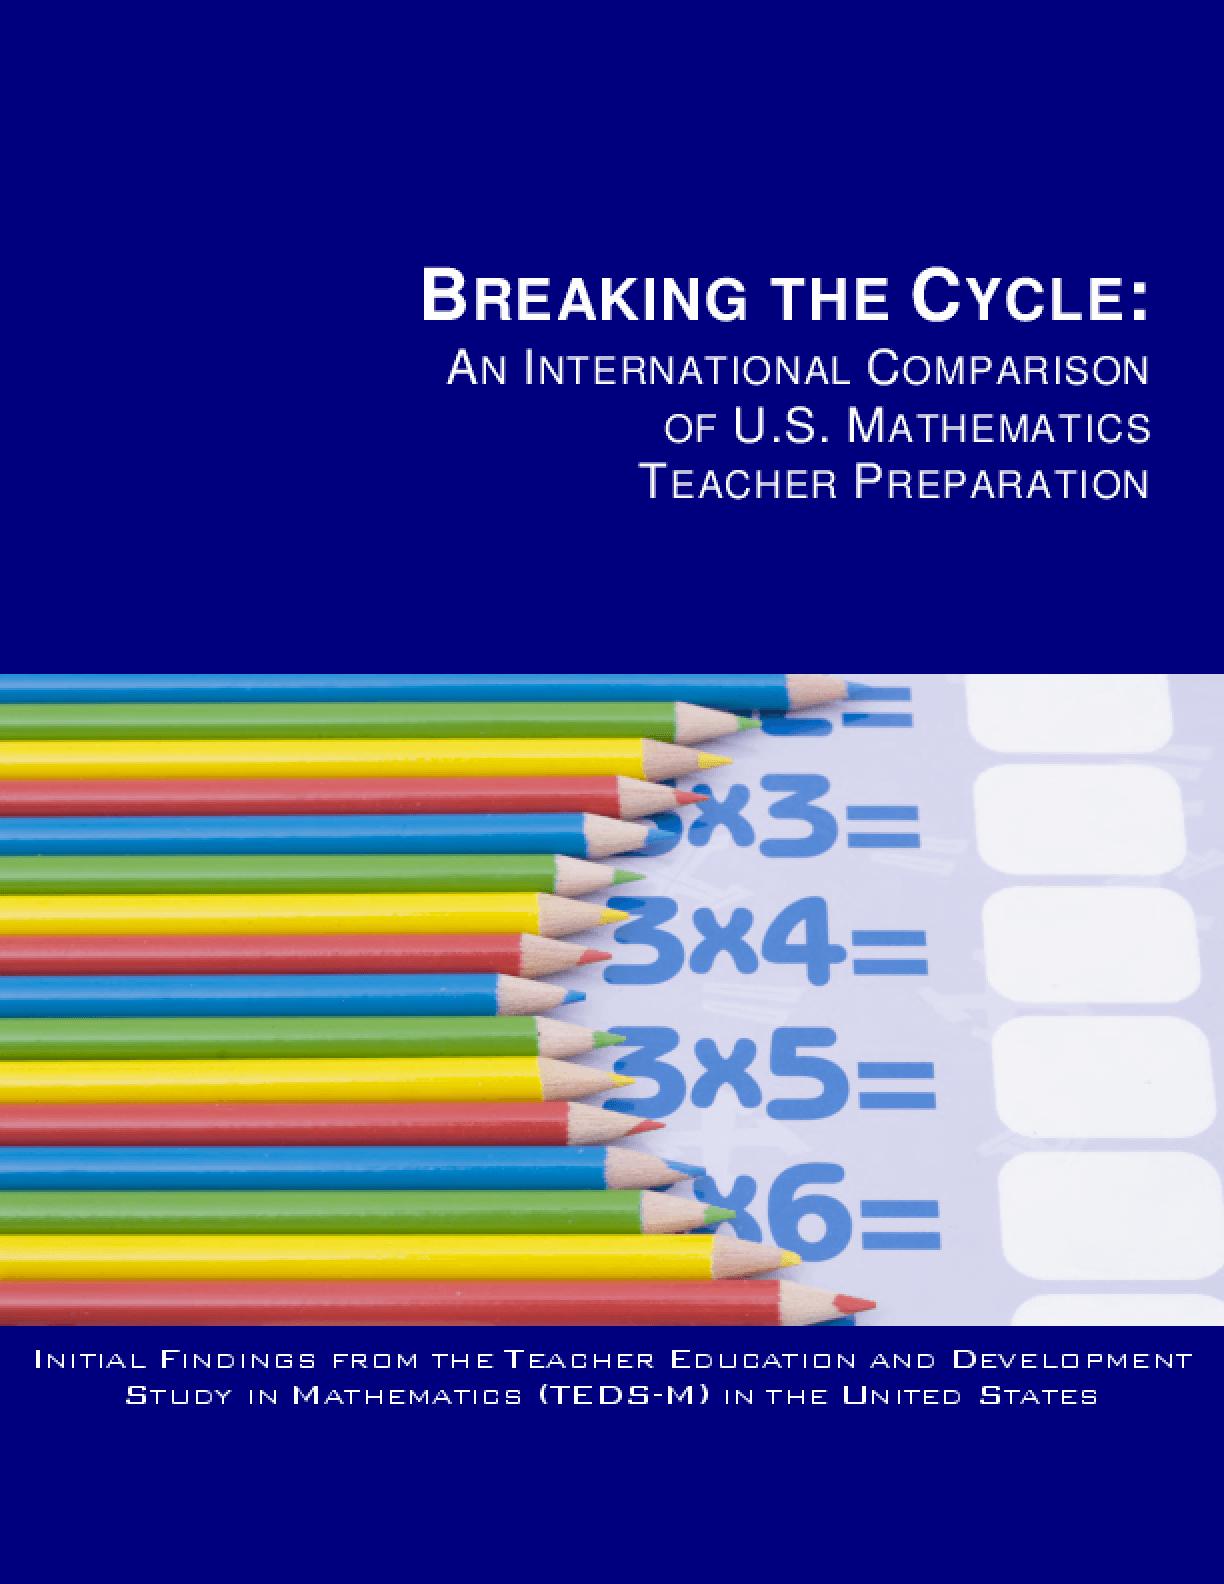 Breaking the Cycle: An International Comparison of U.S. Mathematics Teacher Preparation